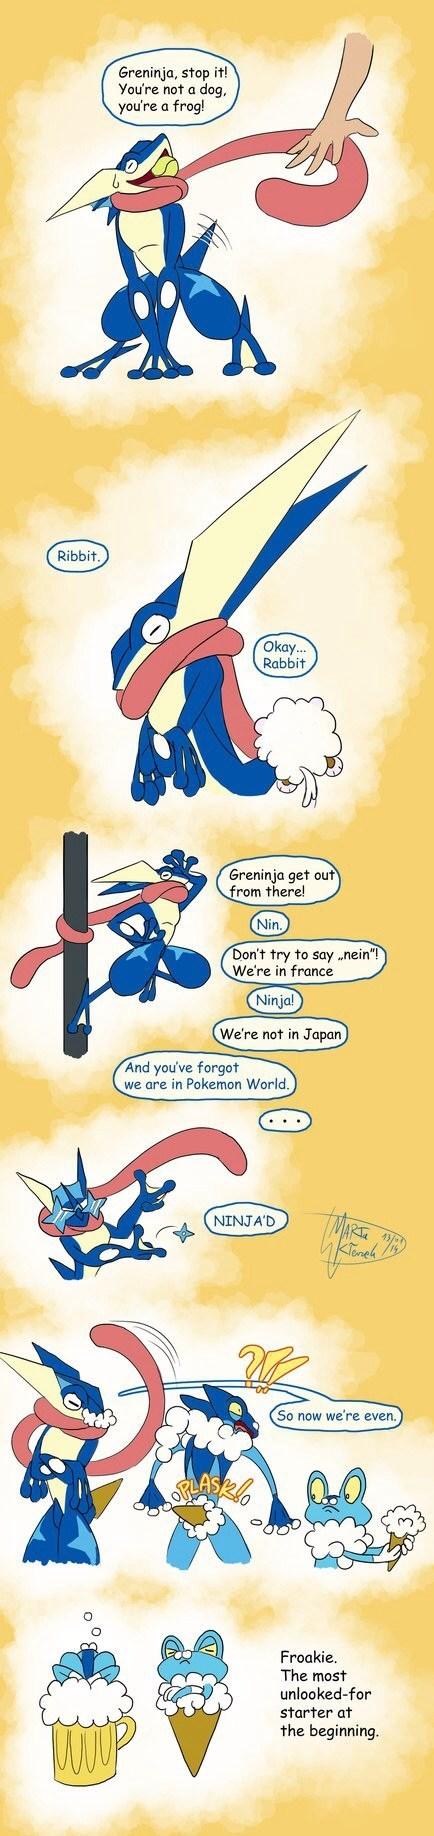 Pokémon greninja - 8078215424